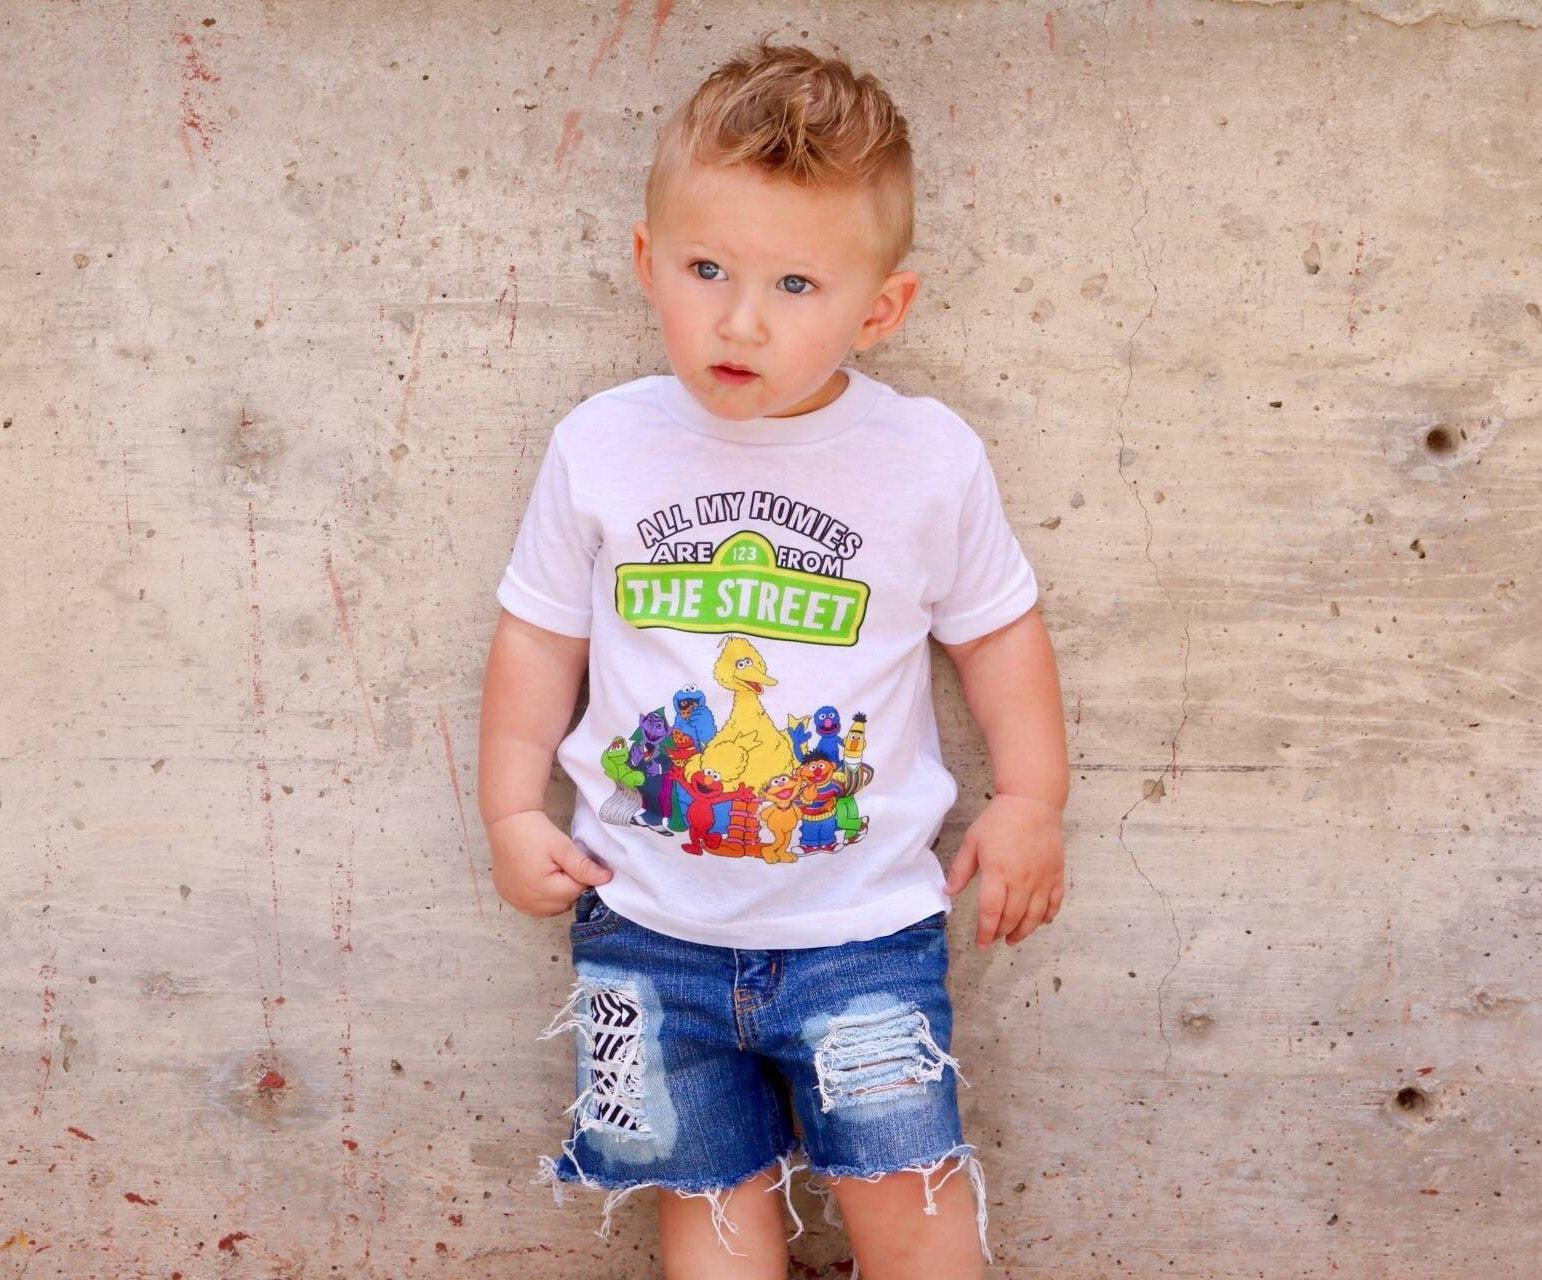 Sesame Street Shirt Funny baby tee Trendy boy shirts All My